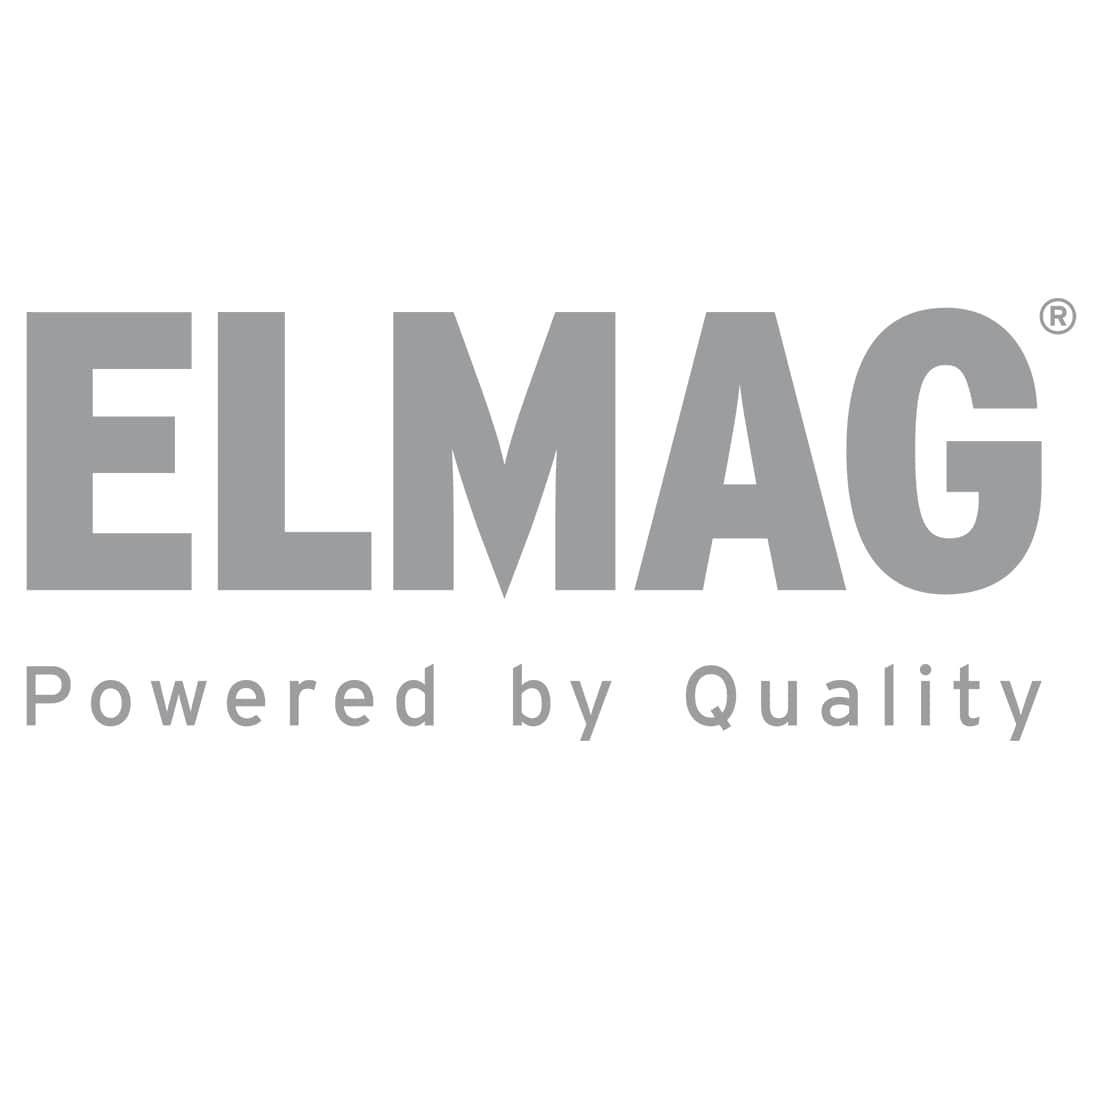 Welding inverter PUMA series 1501 PFC